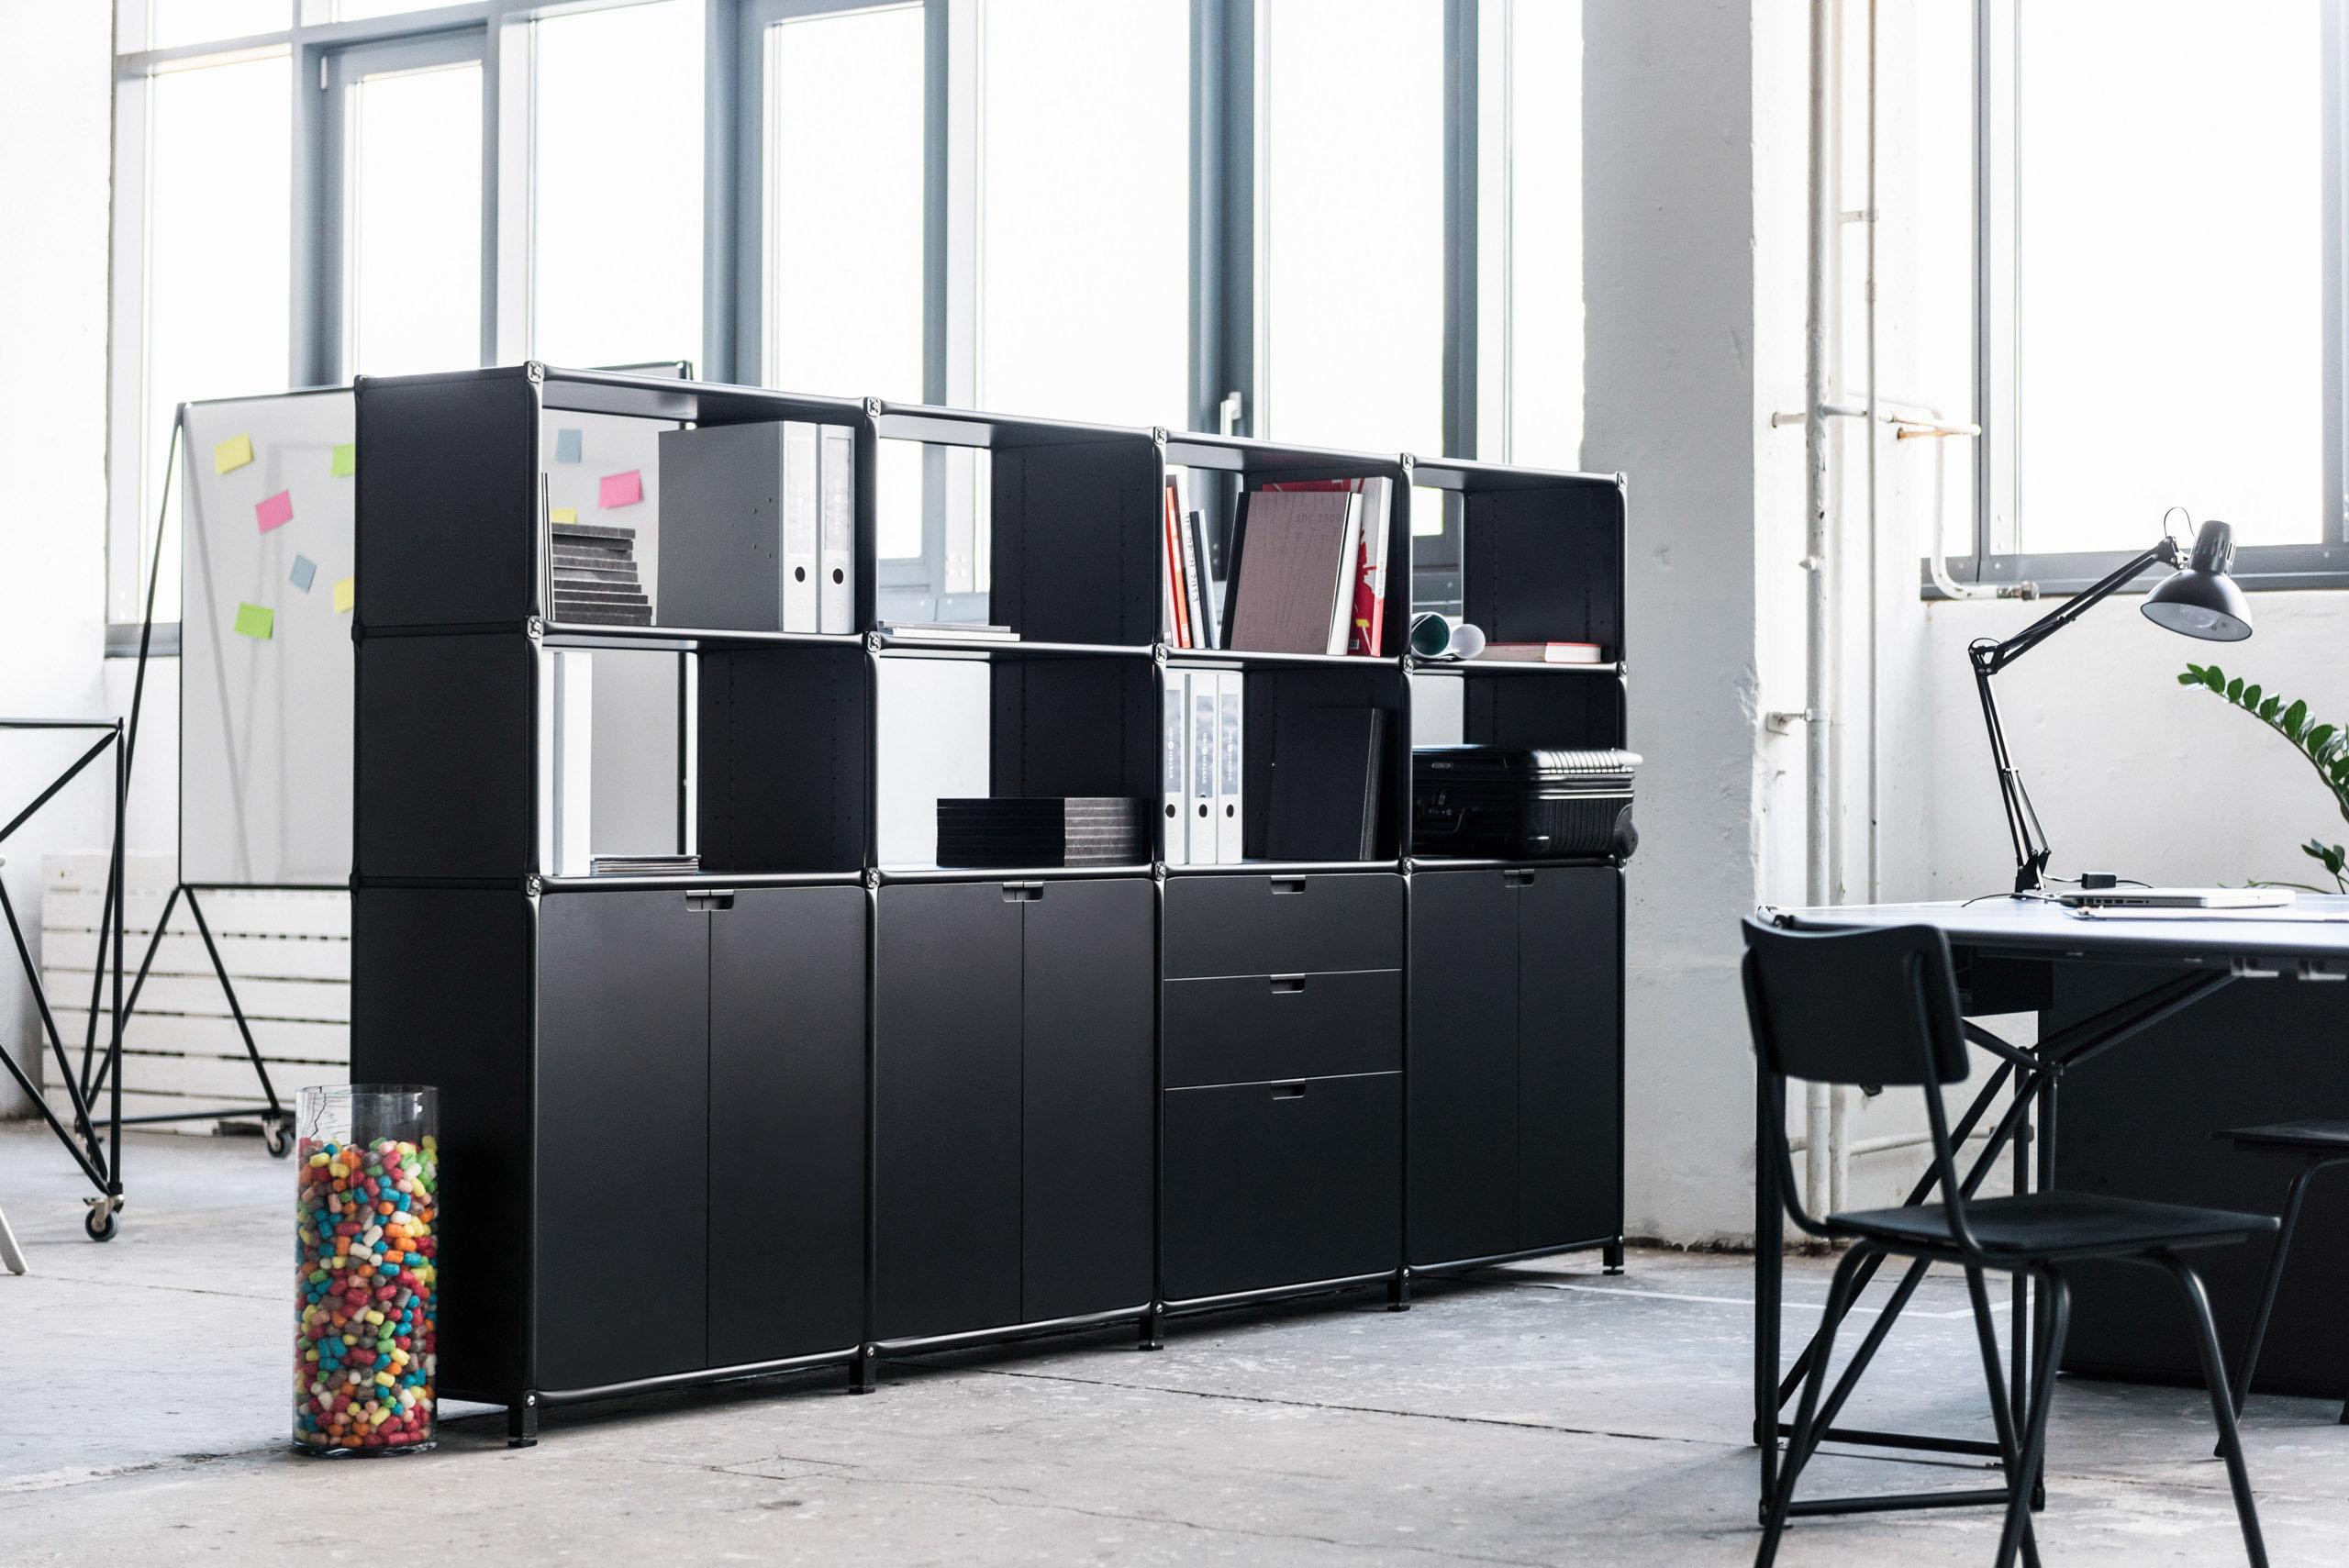 images blackline system 180 modulare einrichtung aus. Black Bedroom Furniture Sets. Home Design Ideas